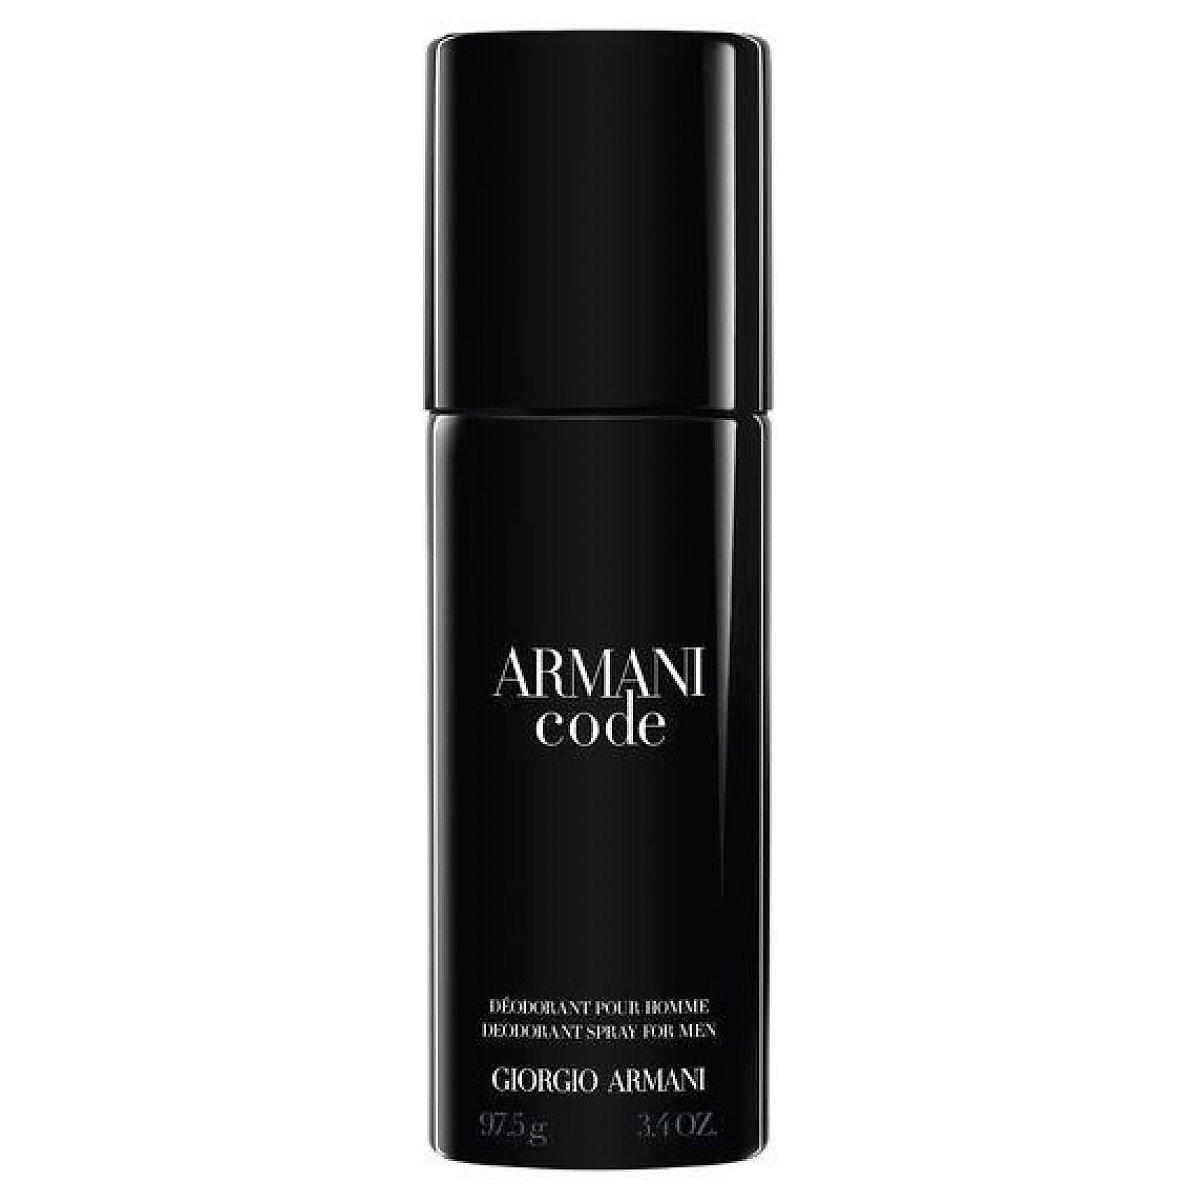 giorgio armani code pour homme dezodorant spray 150ml. Black Bedroom Furniture Sets. Home Design Ideas